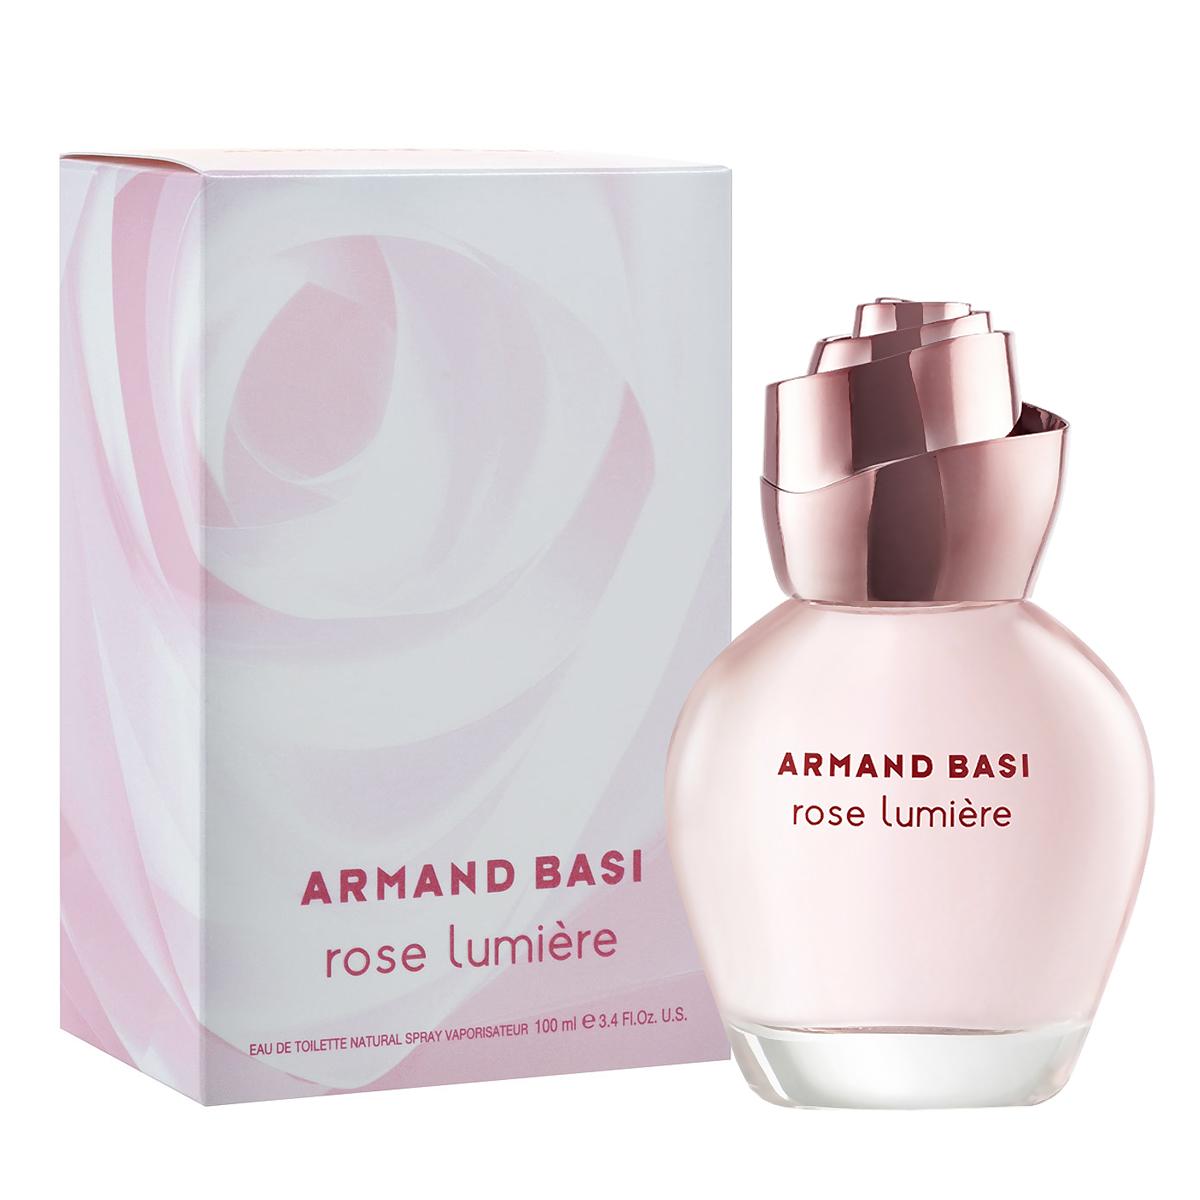 Armand Basi Туалетная вода Rose Lumier, женская, 100 мл armand basi туалетная вода rose glacee 100 ml